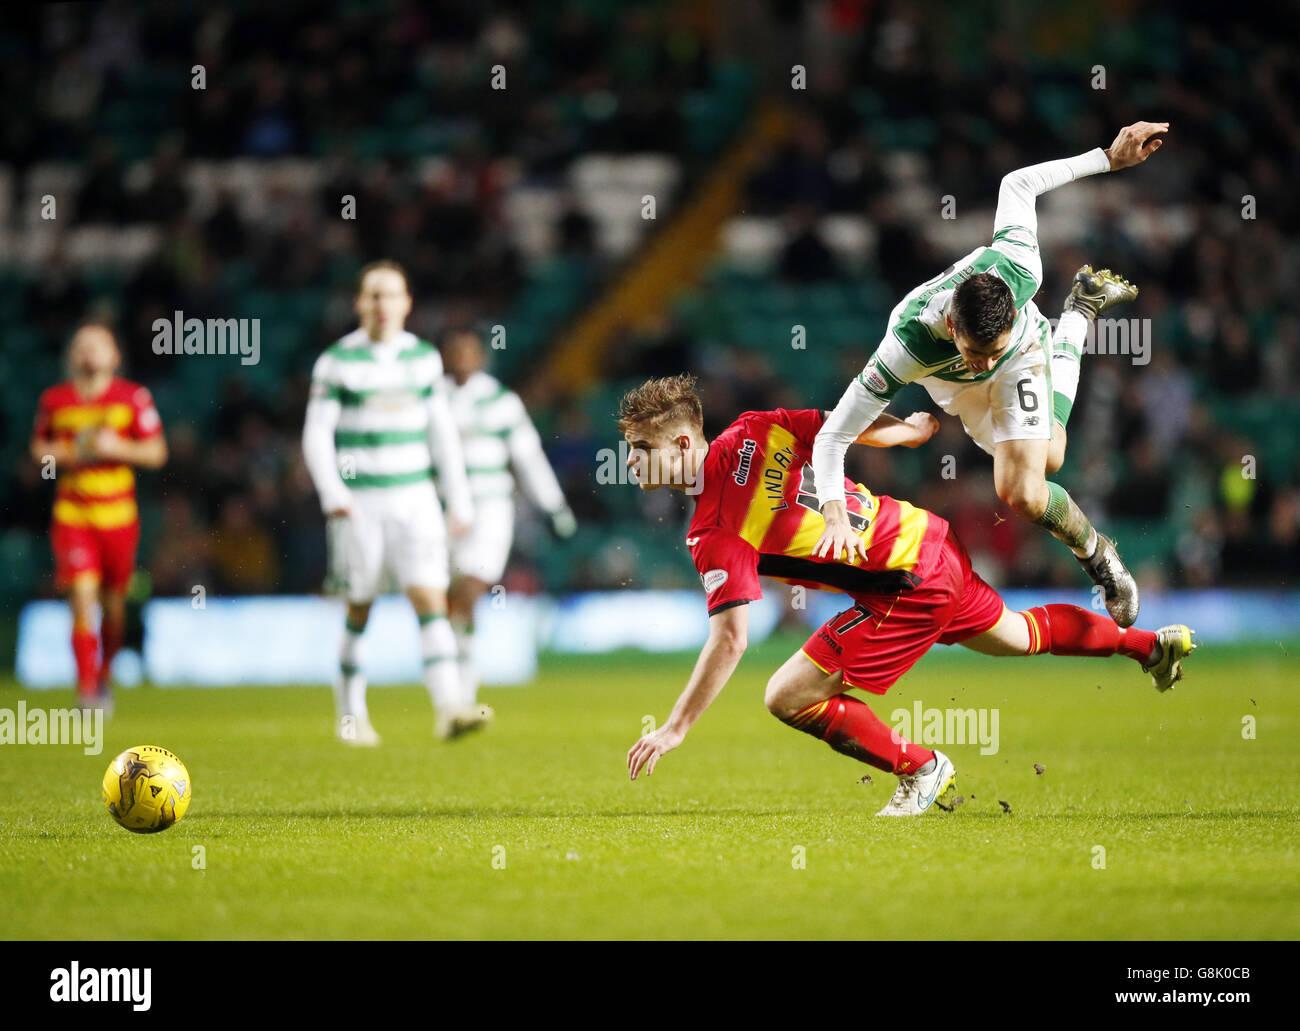 Celtic v Partick Thistle - Scottish Premiership - Celtic Park - Stock Image